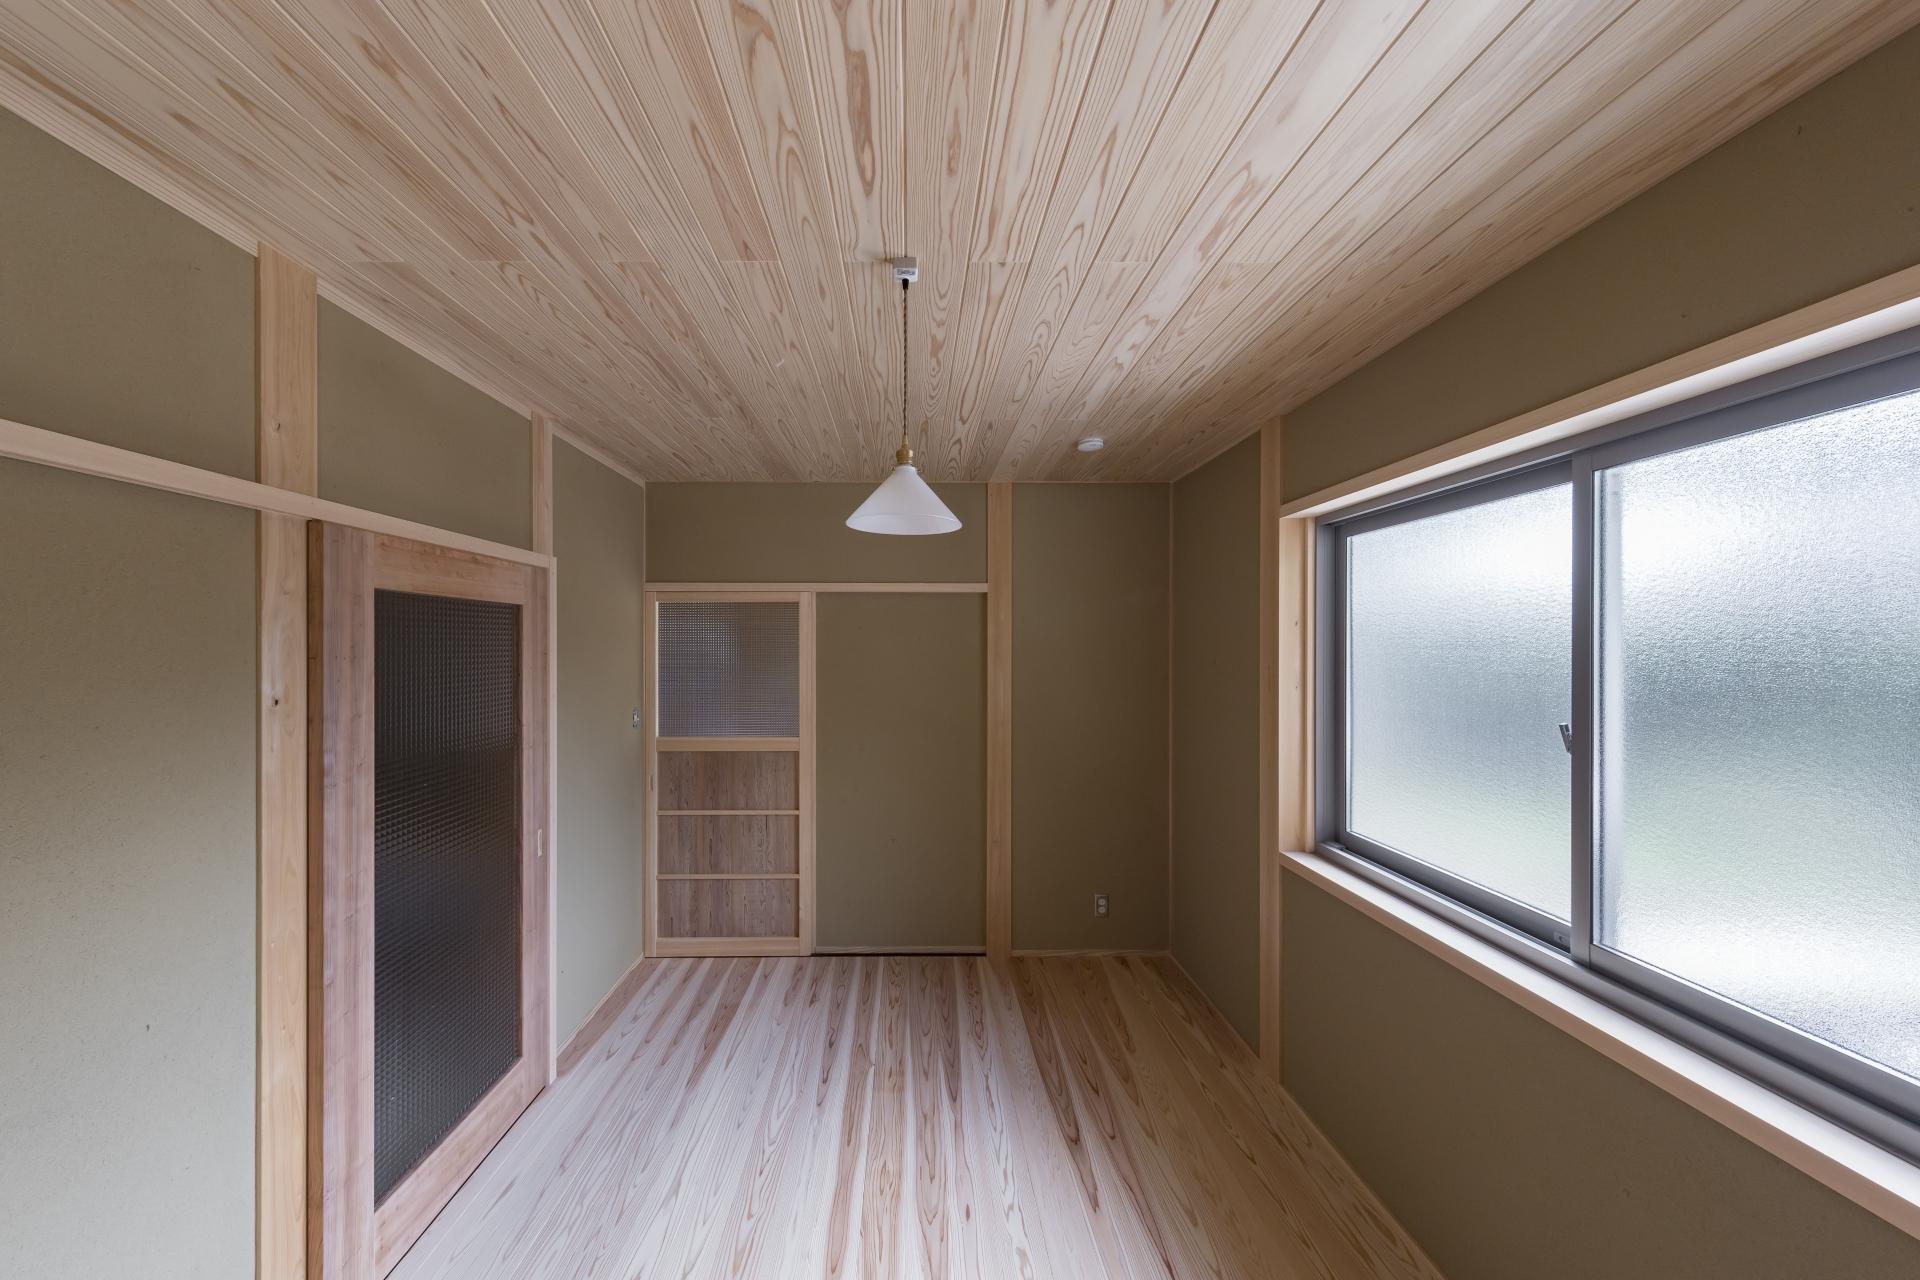 WOODLIFE style 丸守木材【子育て、自然素材、平屋】木の香りに包まれて休める寝室。窓もレトロにこだわった。建具は職人の手作り。無駄を省いてシンプルにした